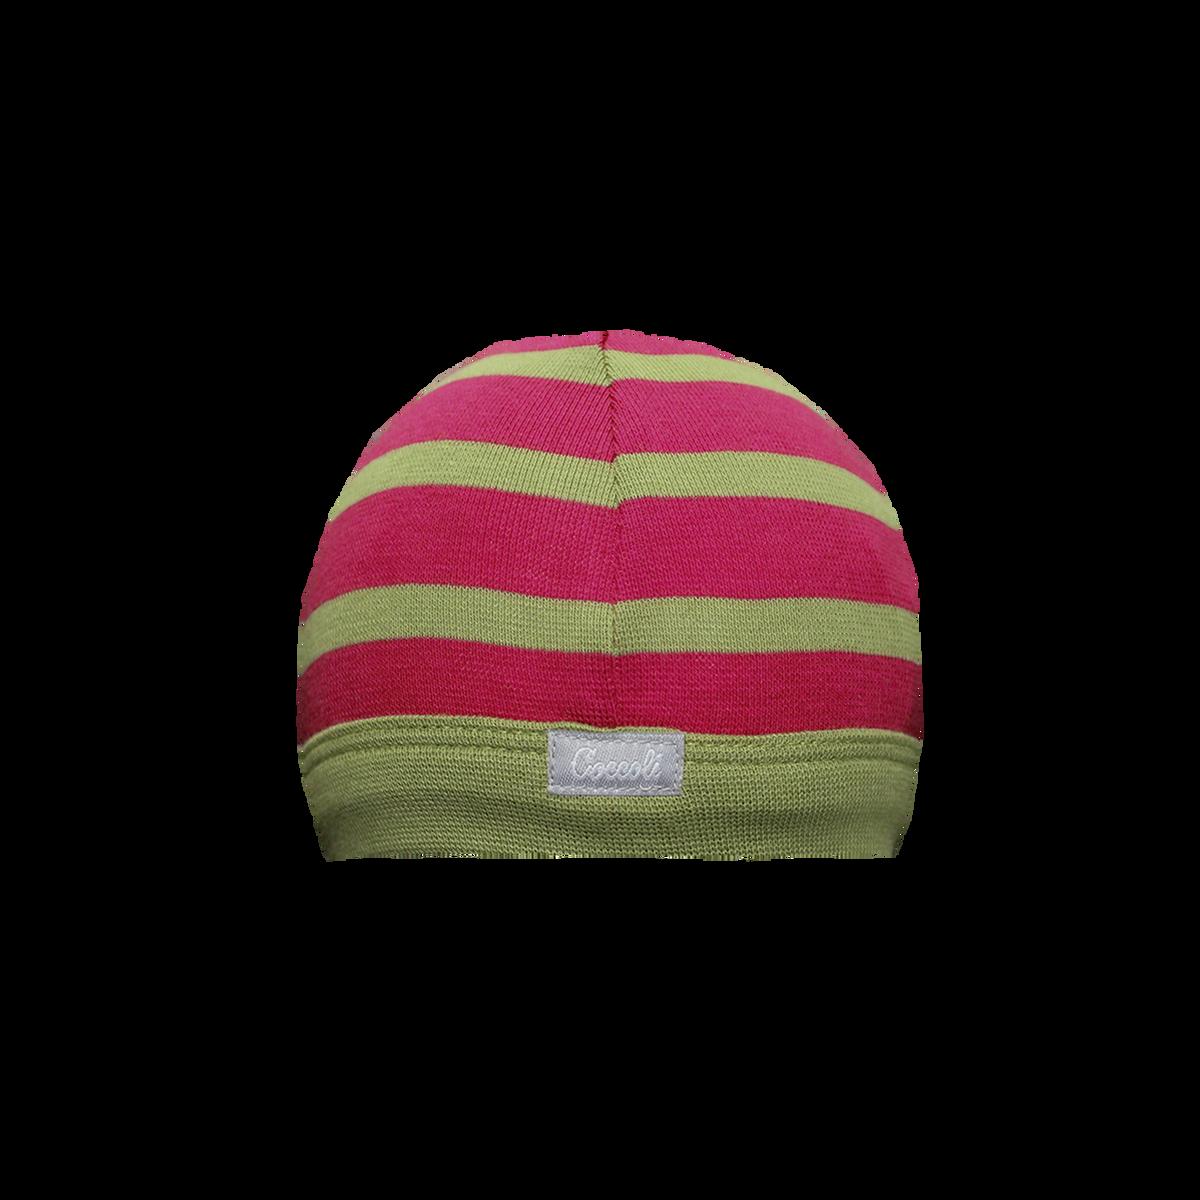 Coccoli Rib | Cap | N/1 - 9/12m | B4113-164